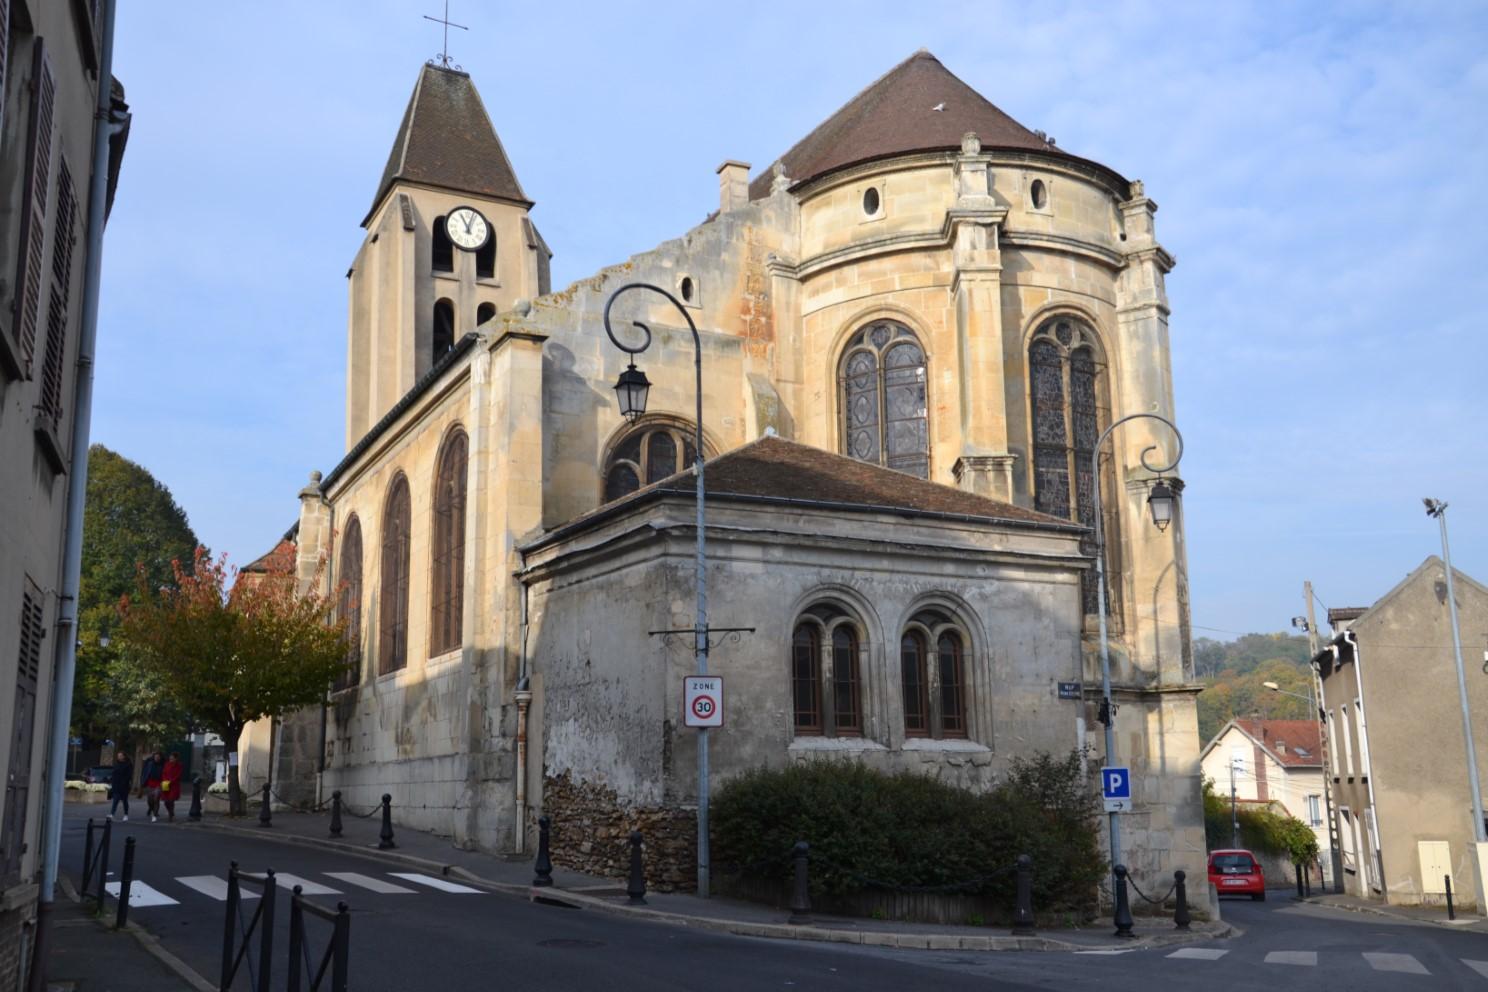 Eglise Saint-Martin de Groslay